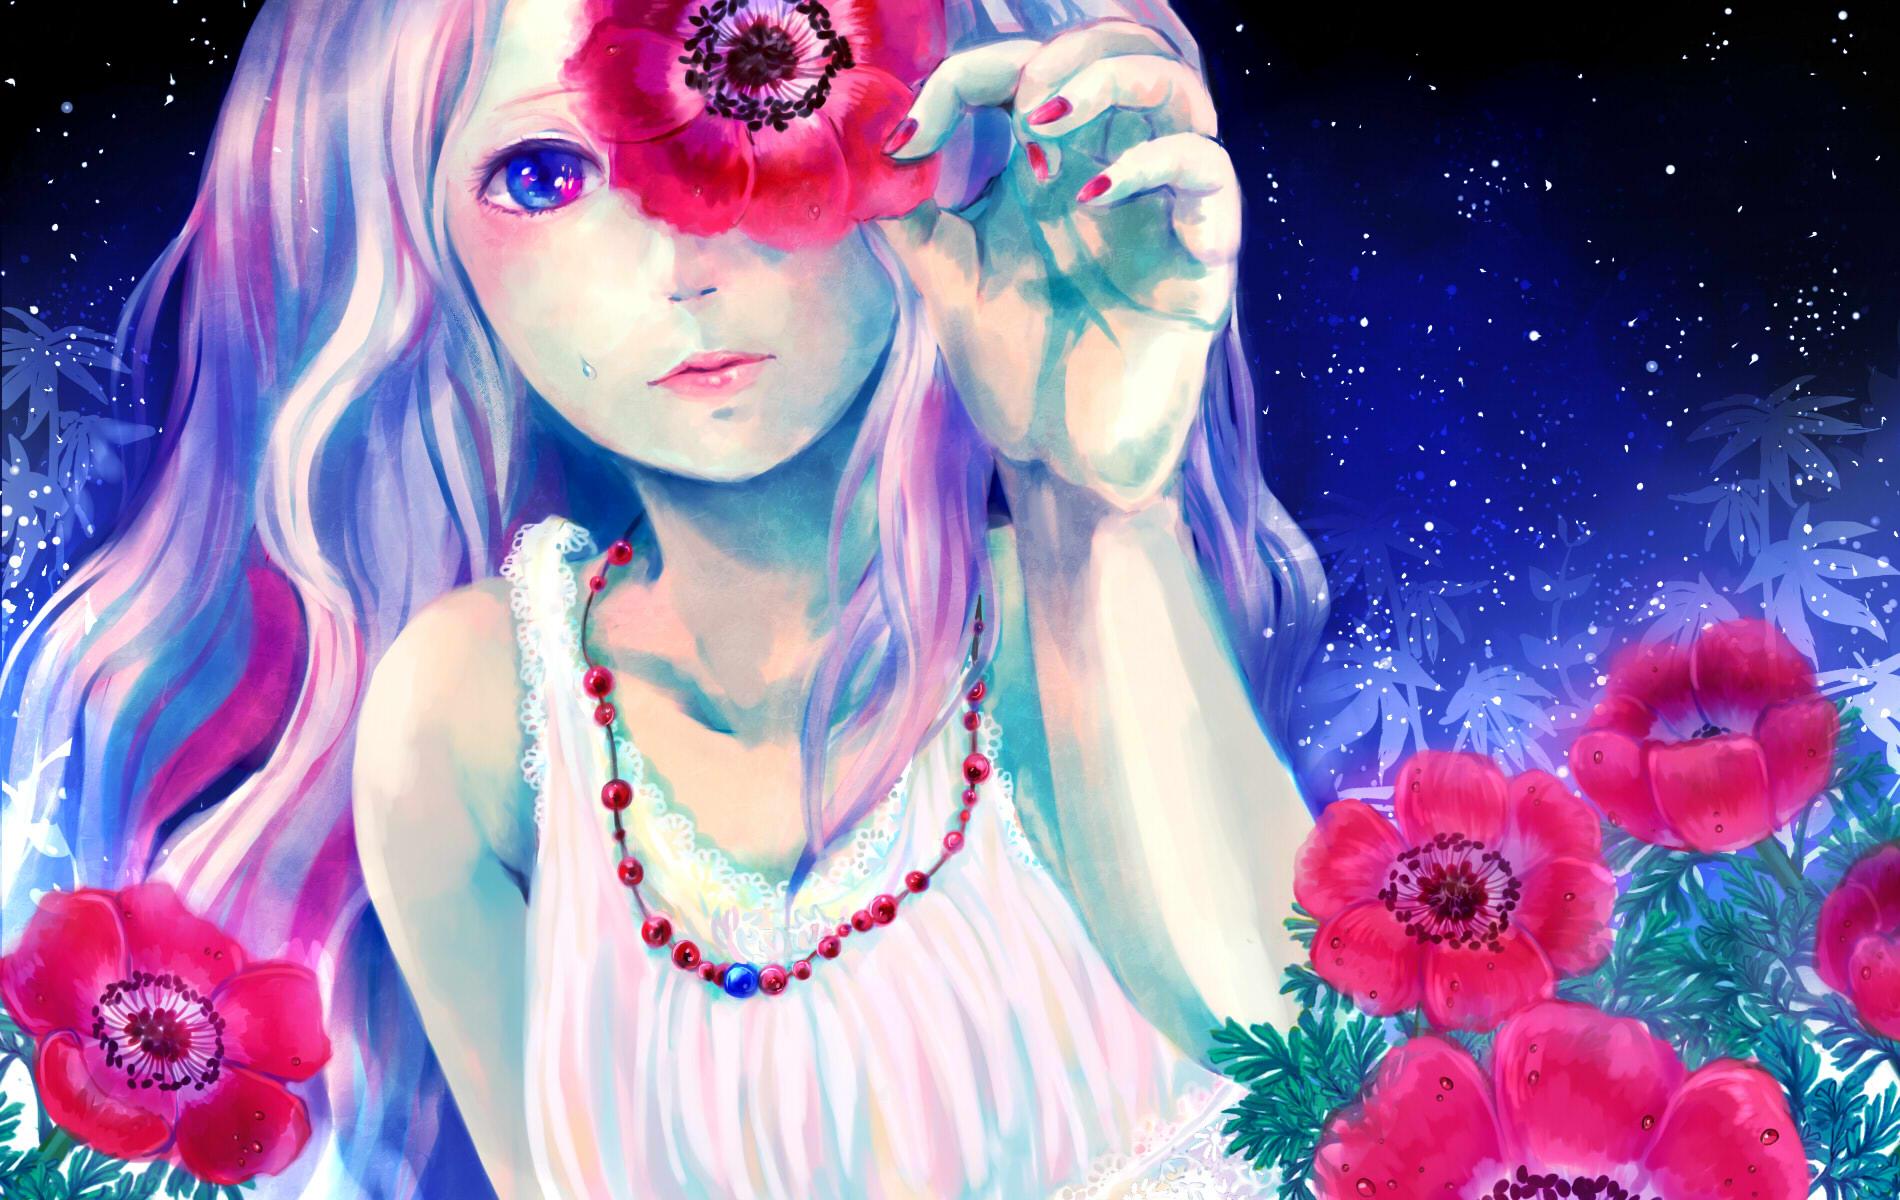 Арт фото девушек с цветами